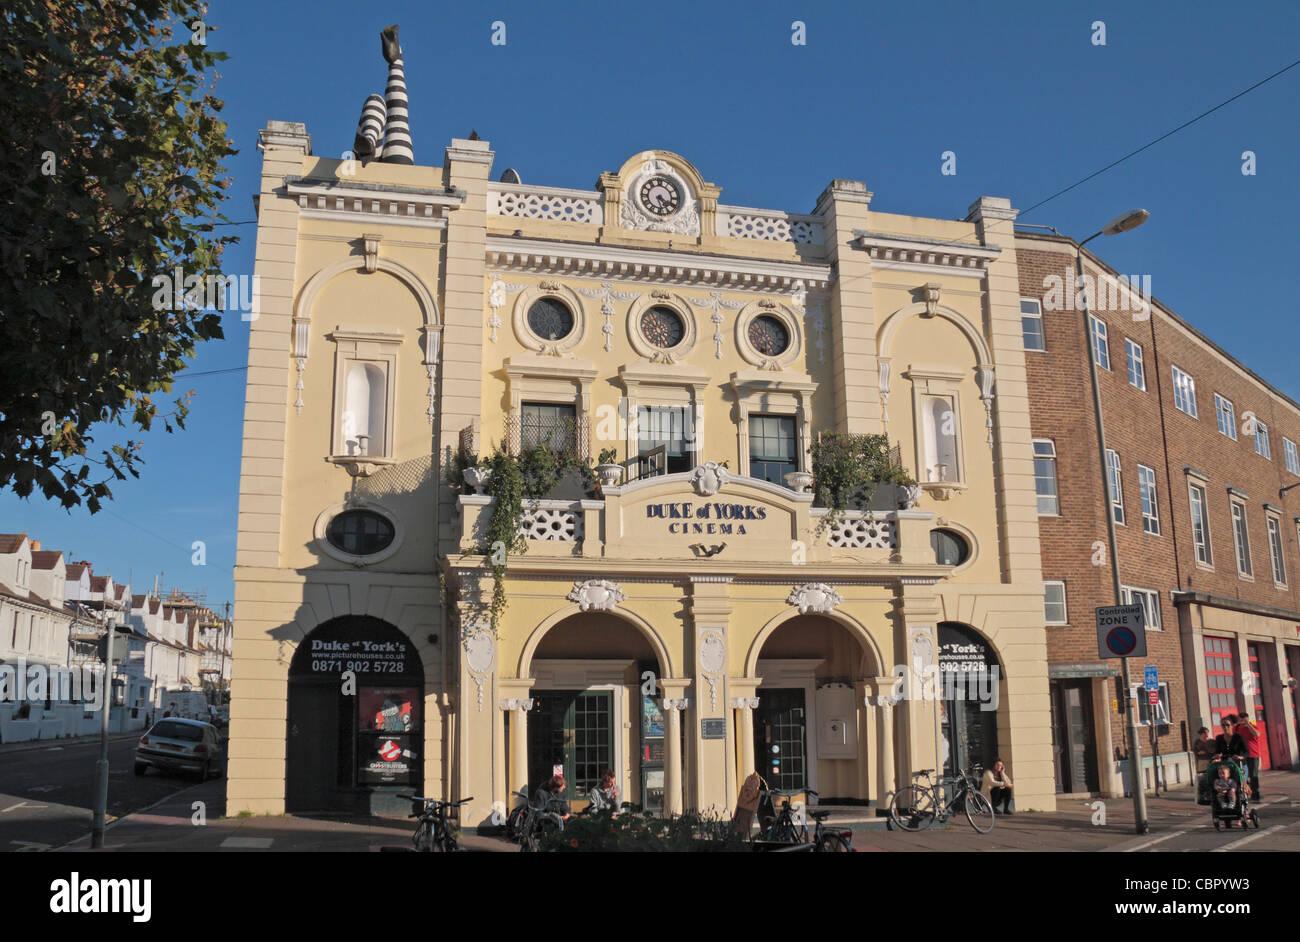 The Duke of York's Picturehouse cinema on Preston Circus. Brighton, UK. - Stock Image